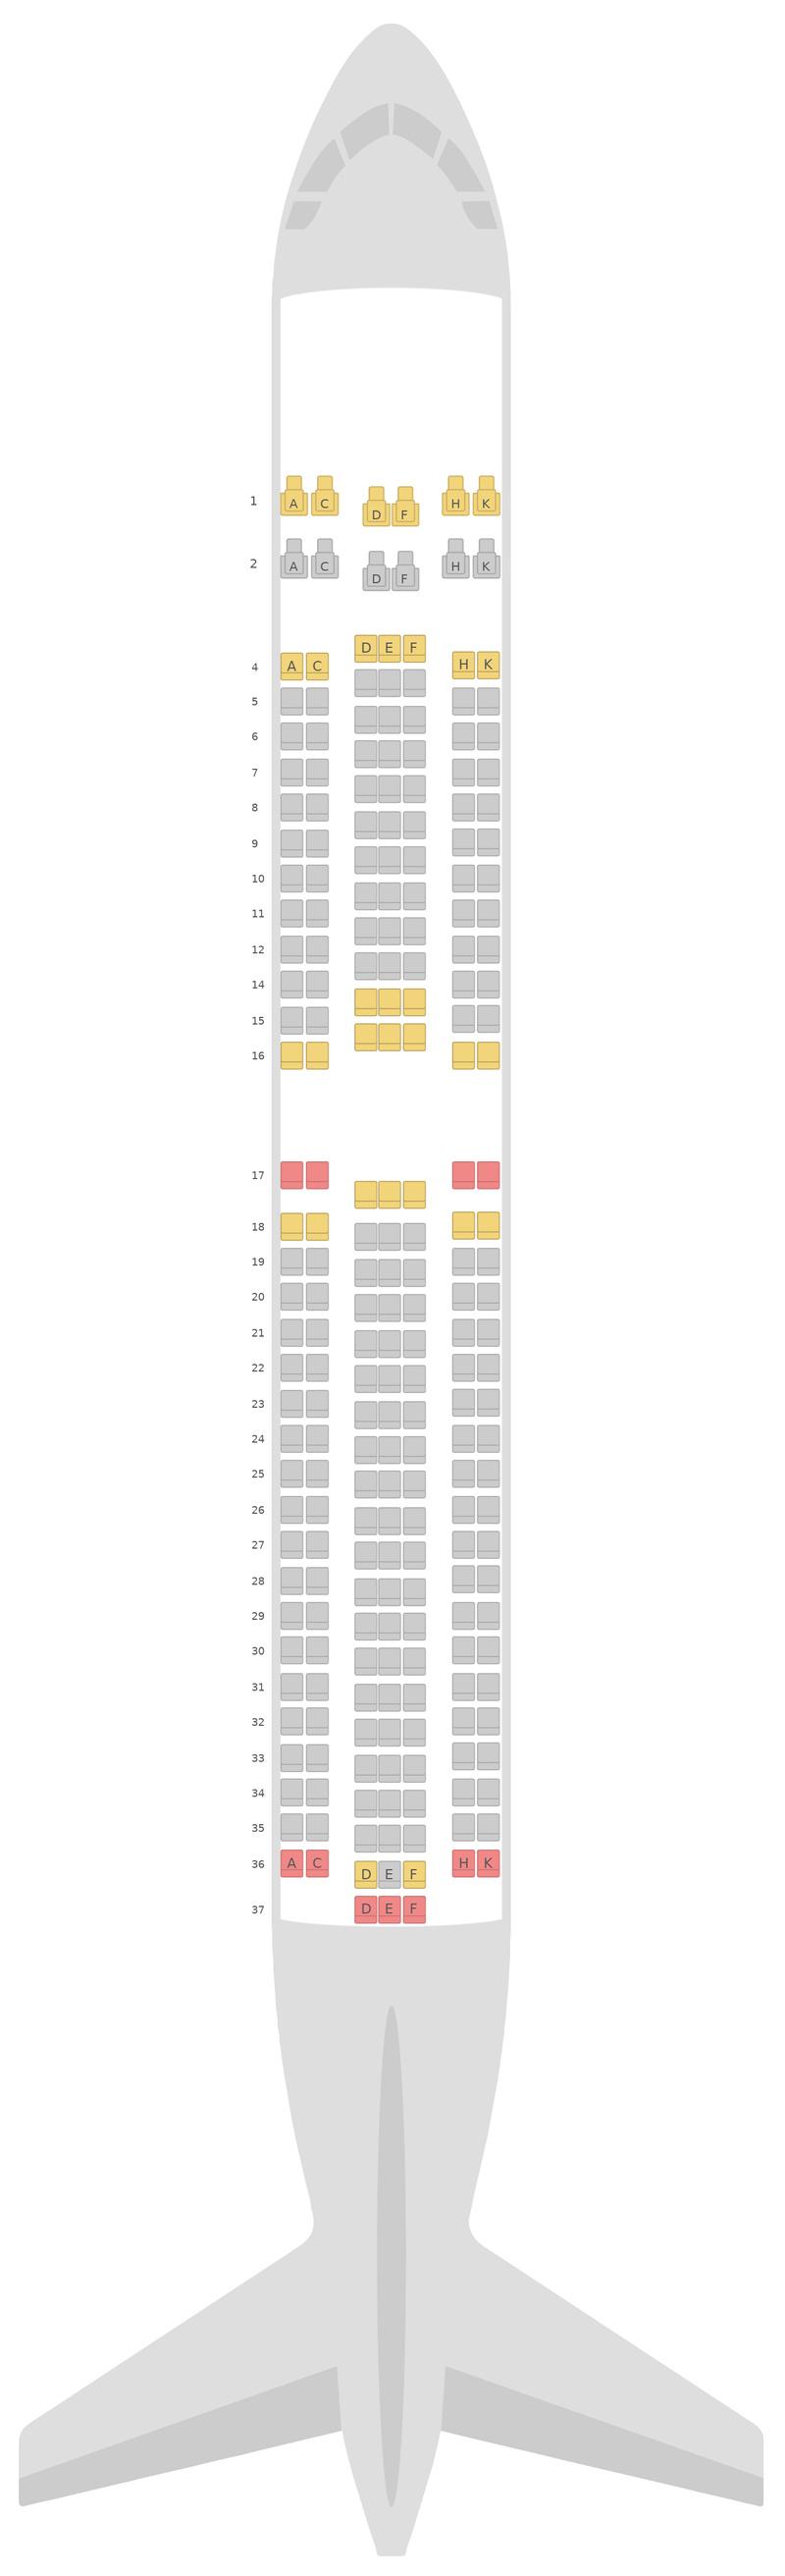 Sitzplan Boeing 767-300ER v2 Royal Air Maroc